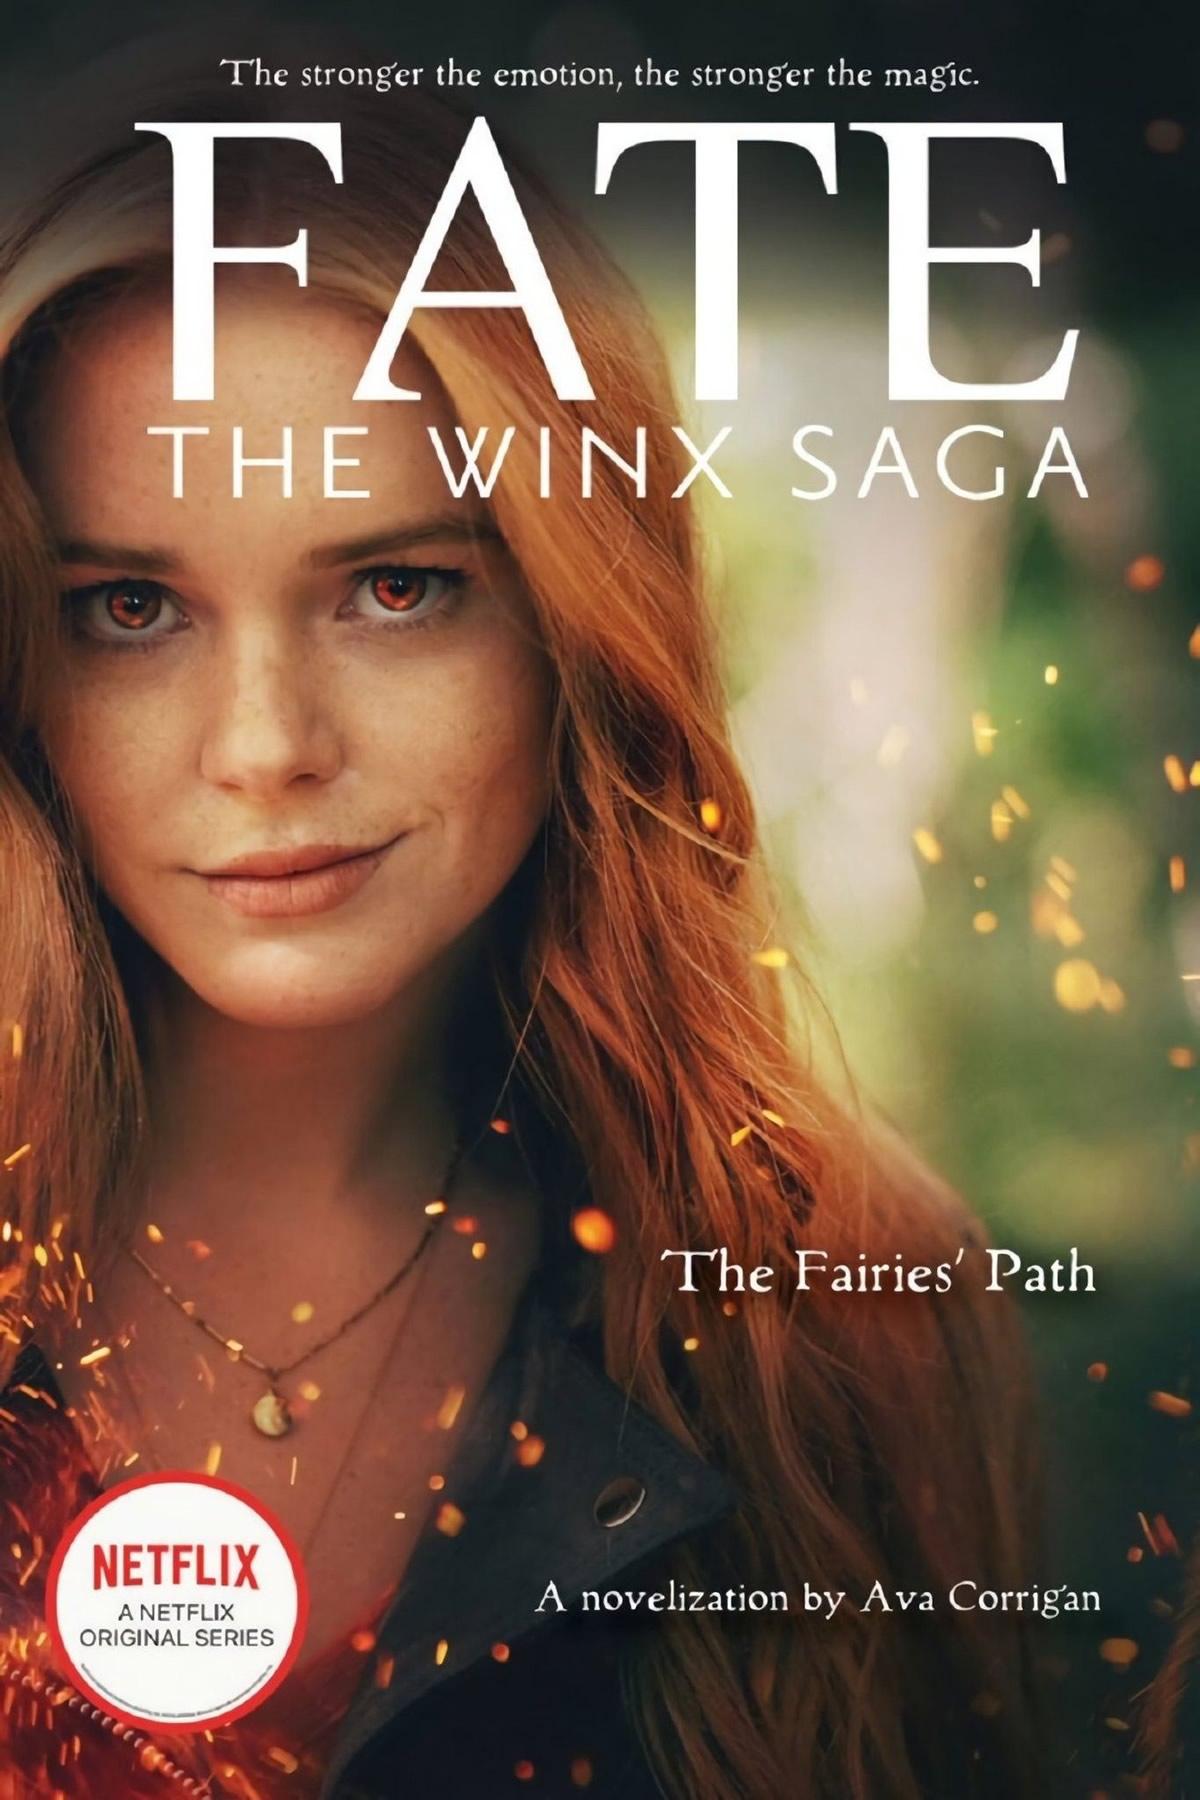 fate a saga winx netflix divulga trailer final legendado - Fate: A Saga Winx | Netflix divulga trailer final legendado